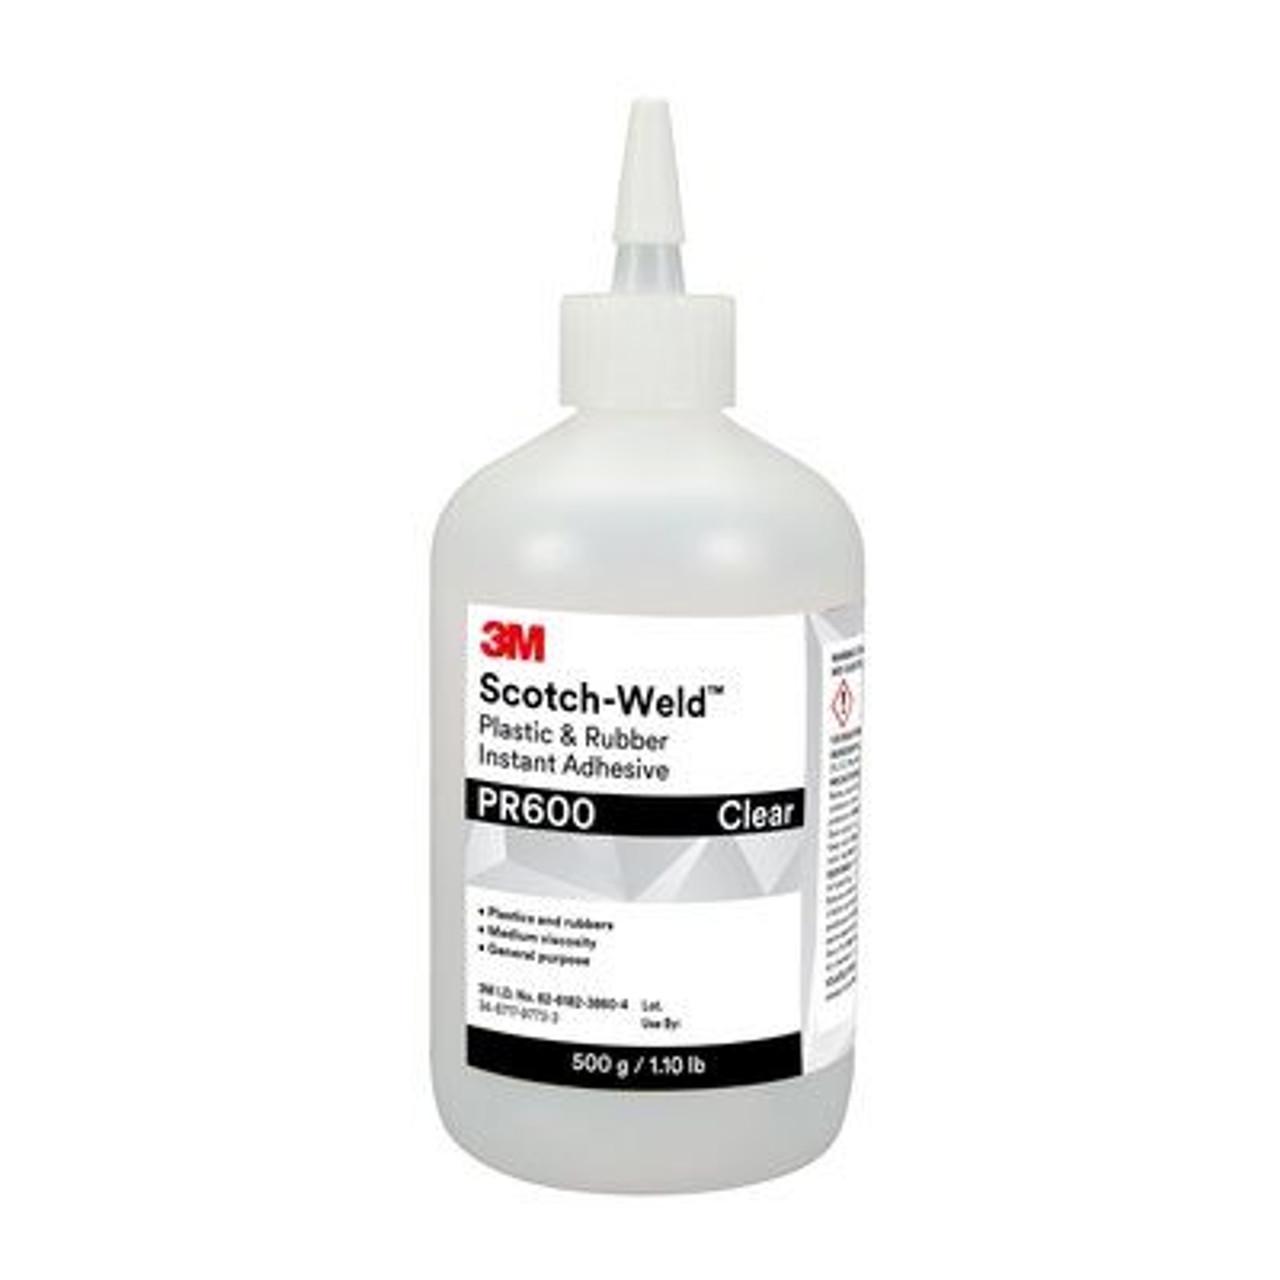 3M™ Scotch-Weld™ Plastic & Rubber Instant Adhesive PR600, Clear, 500 Gram Bottle